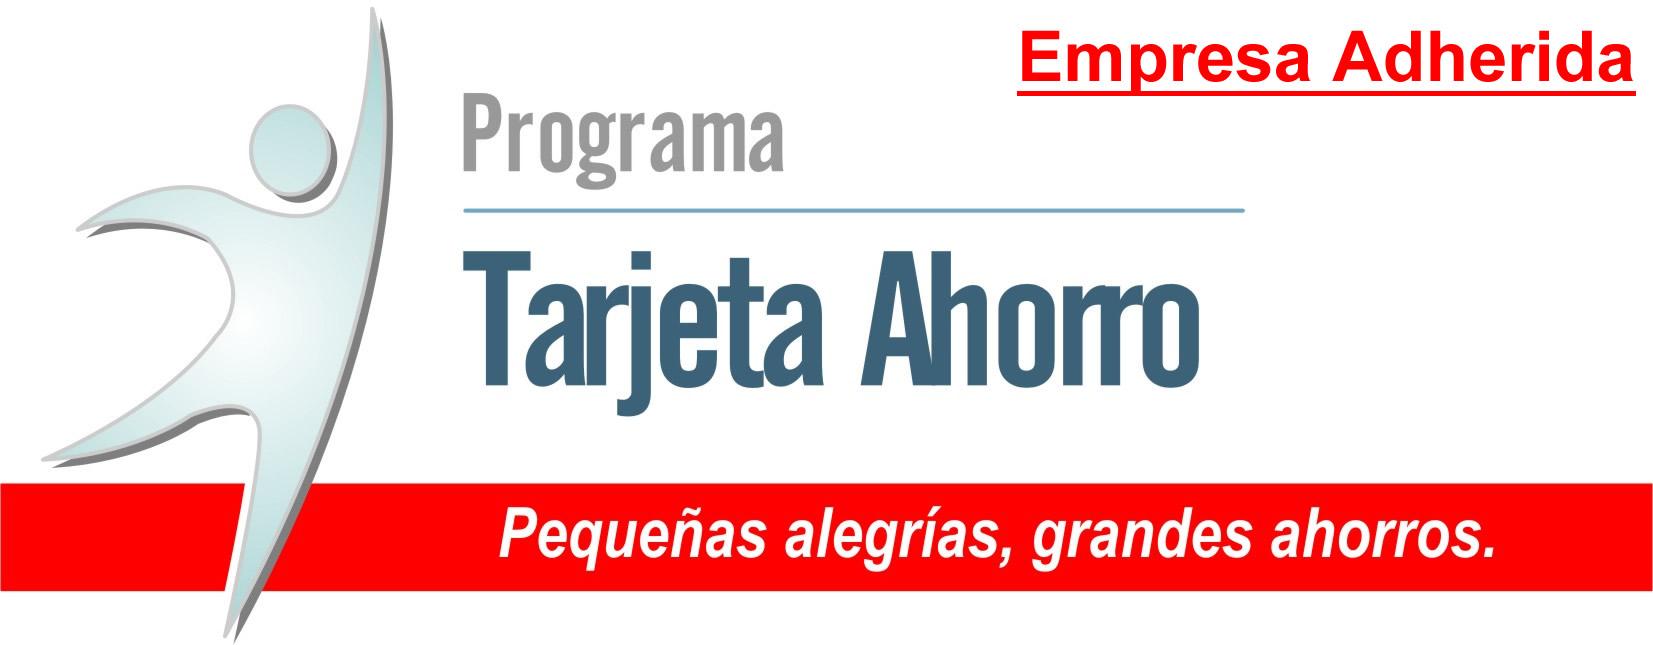 Logo Programa Tarjeta Ahorro